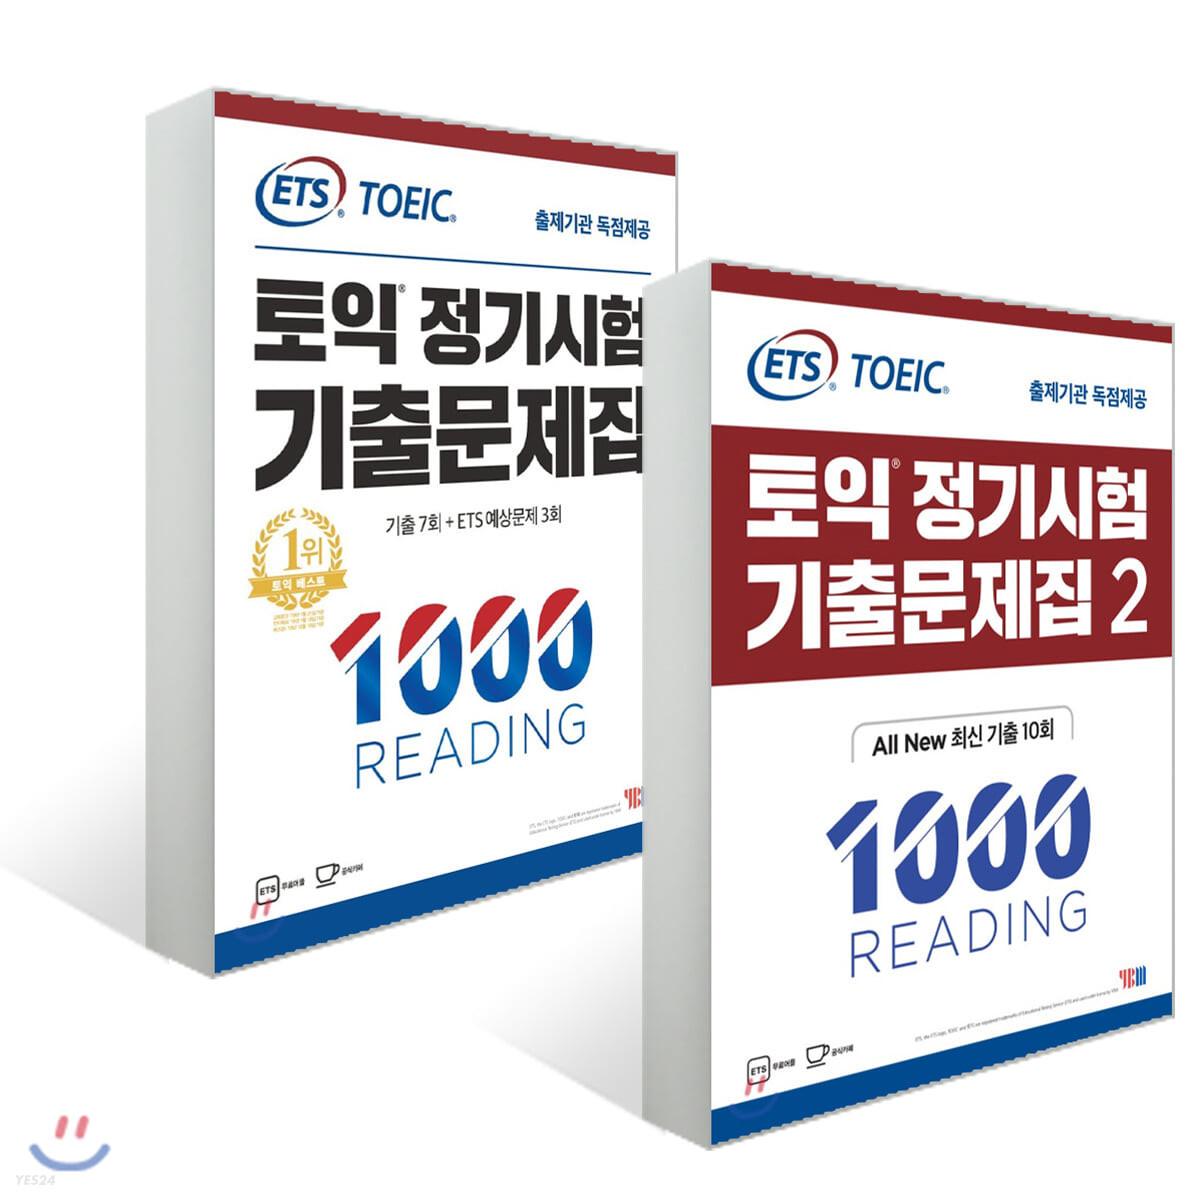 ETS 토익 정기시험 기출문제집 1000 READING 리딩 vol.1~2권 세트